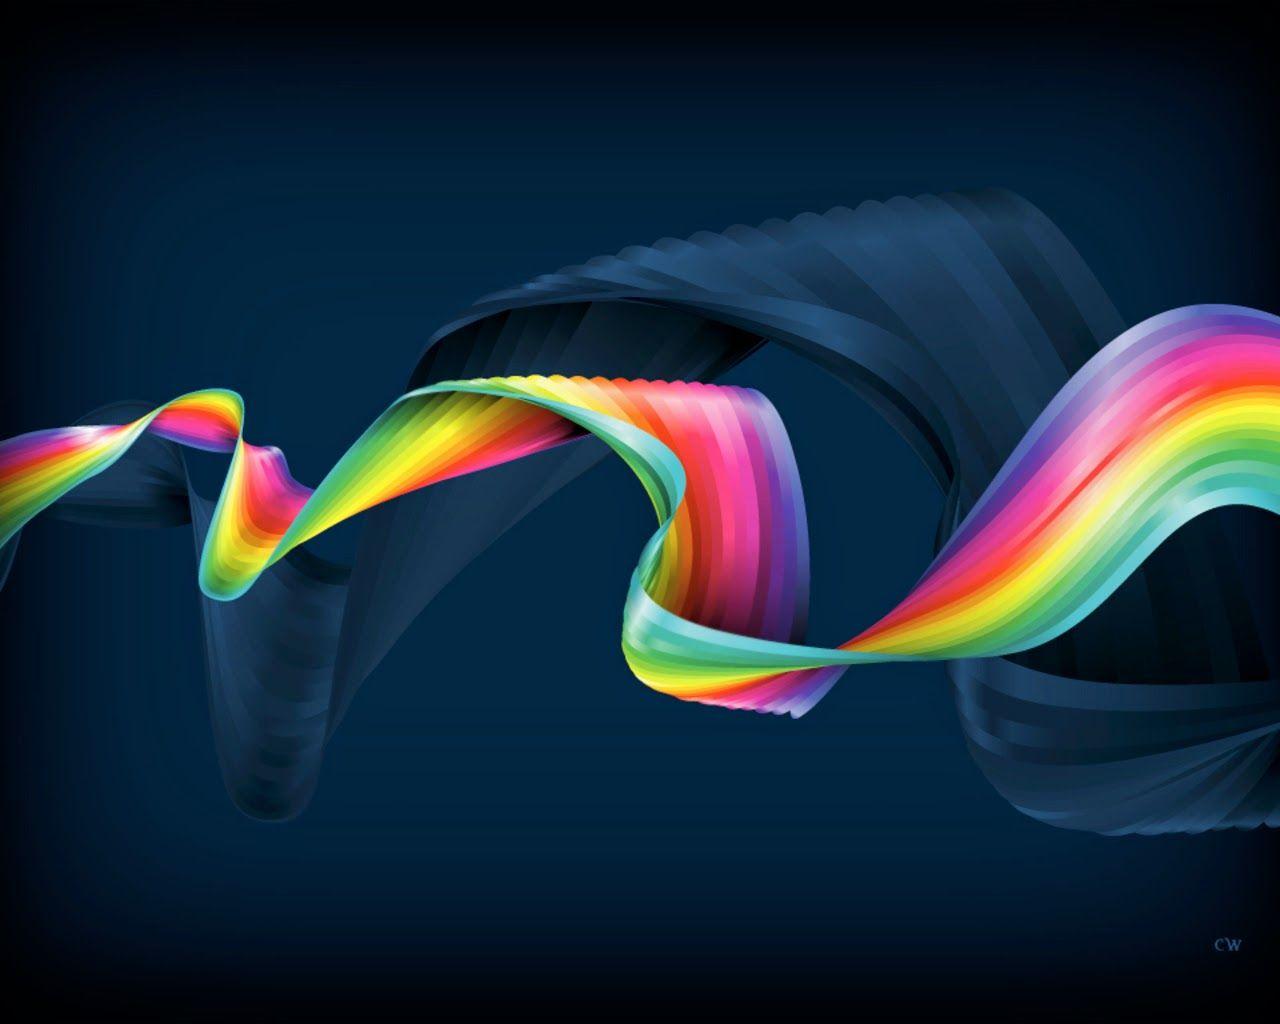 Mix Digital Art HD Wallpapers { SET } Free HD Desktop